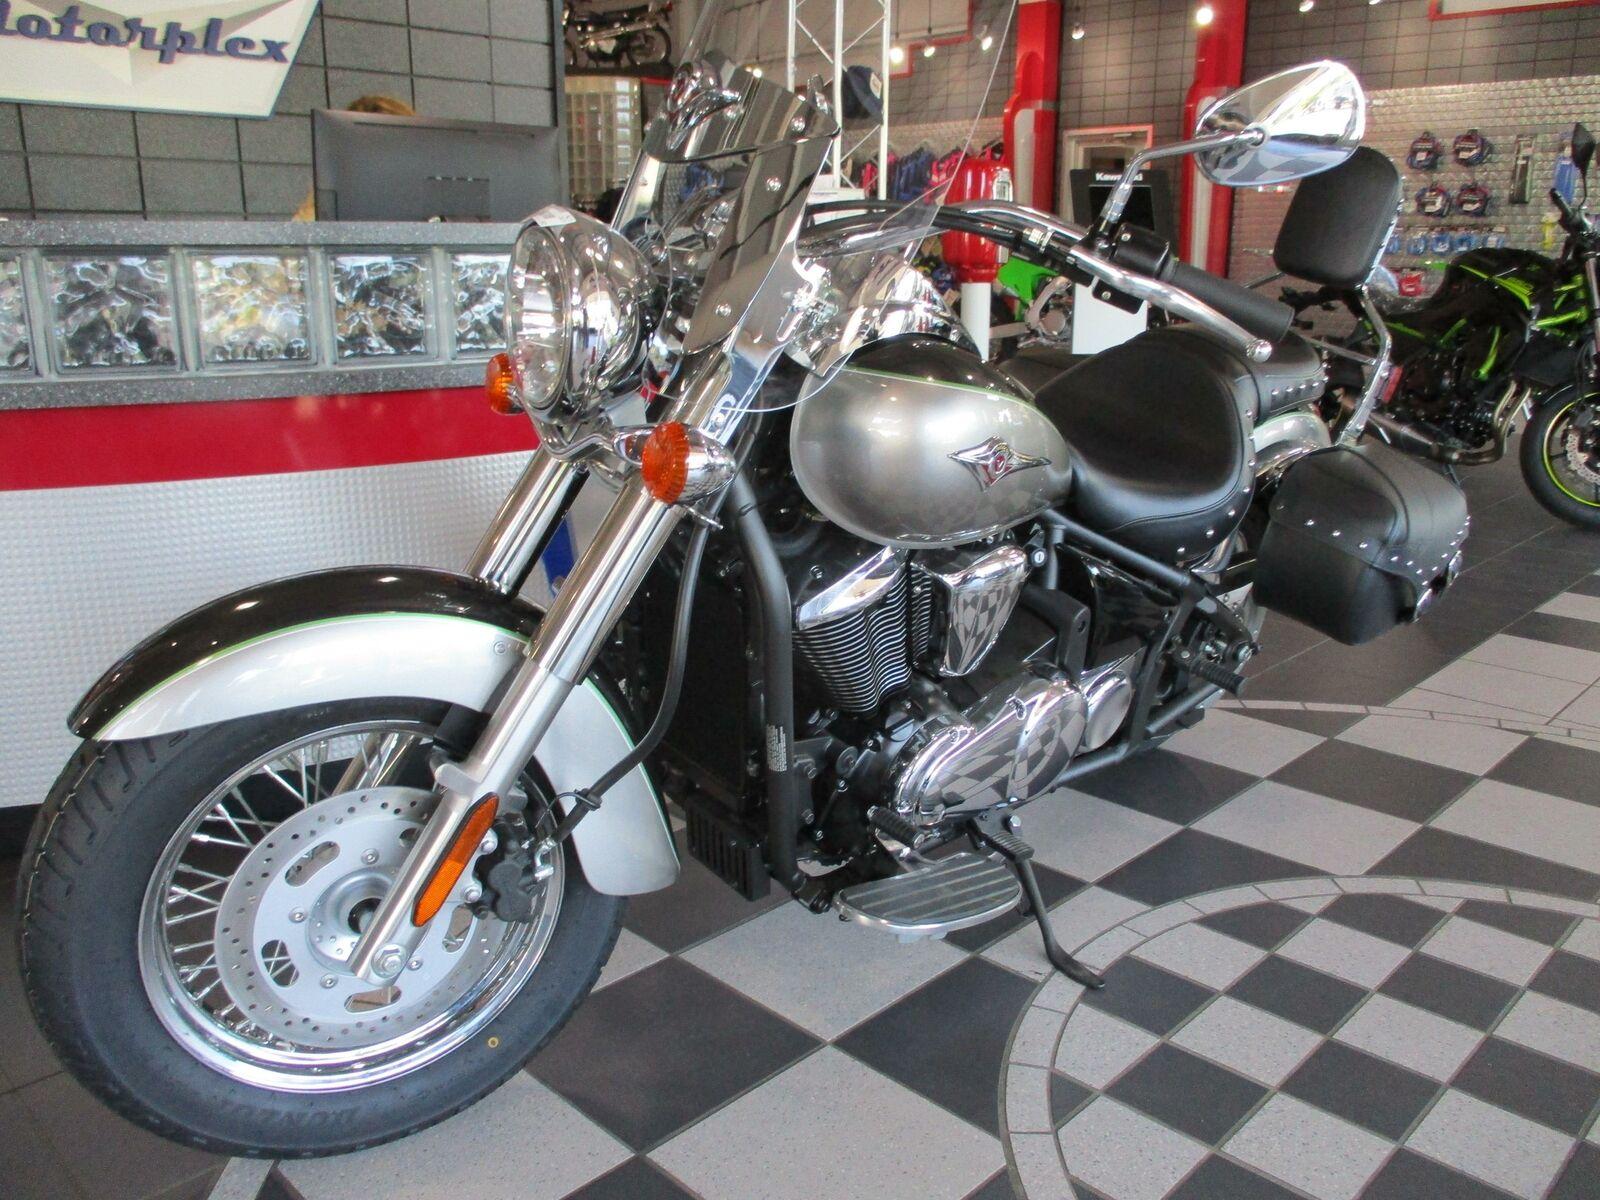 2020 Kawasaki Vulcan 900 Classic LT | eBay